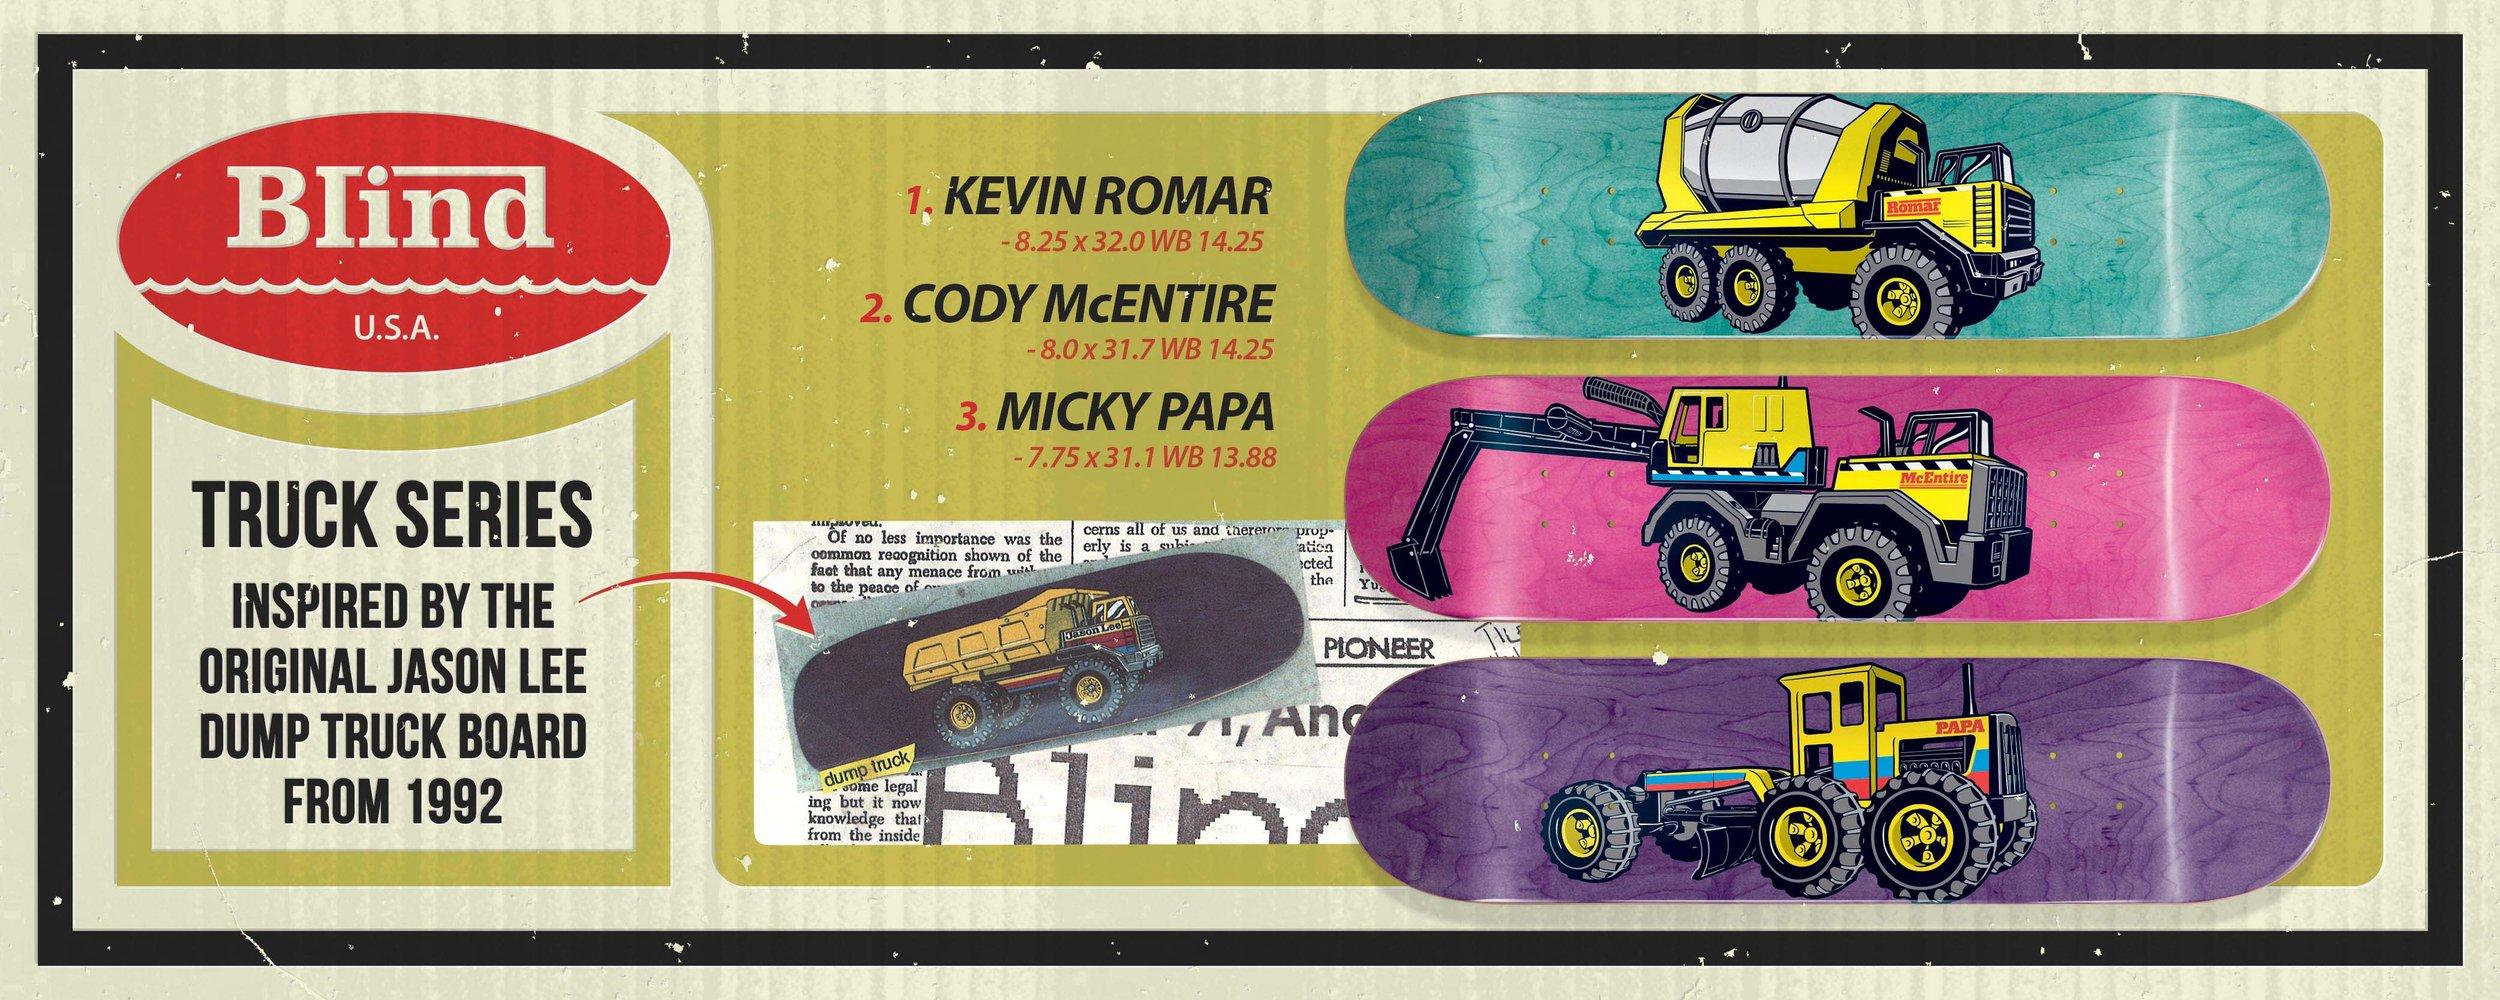 Truck_Series_1500x600.jpg